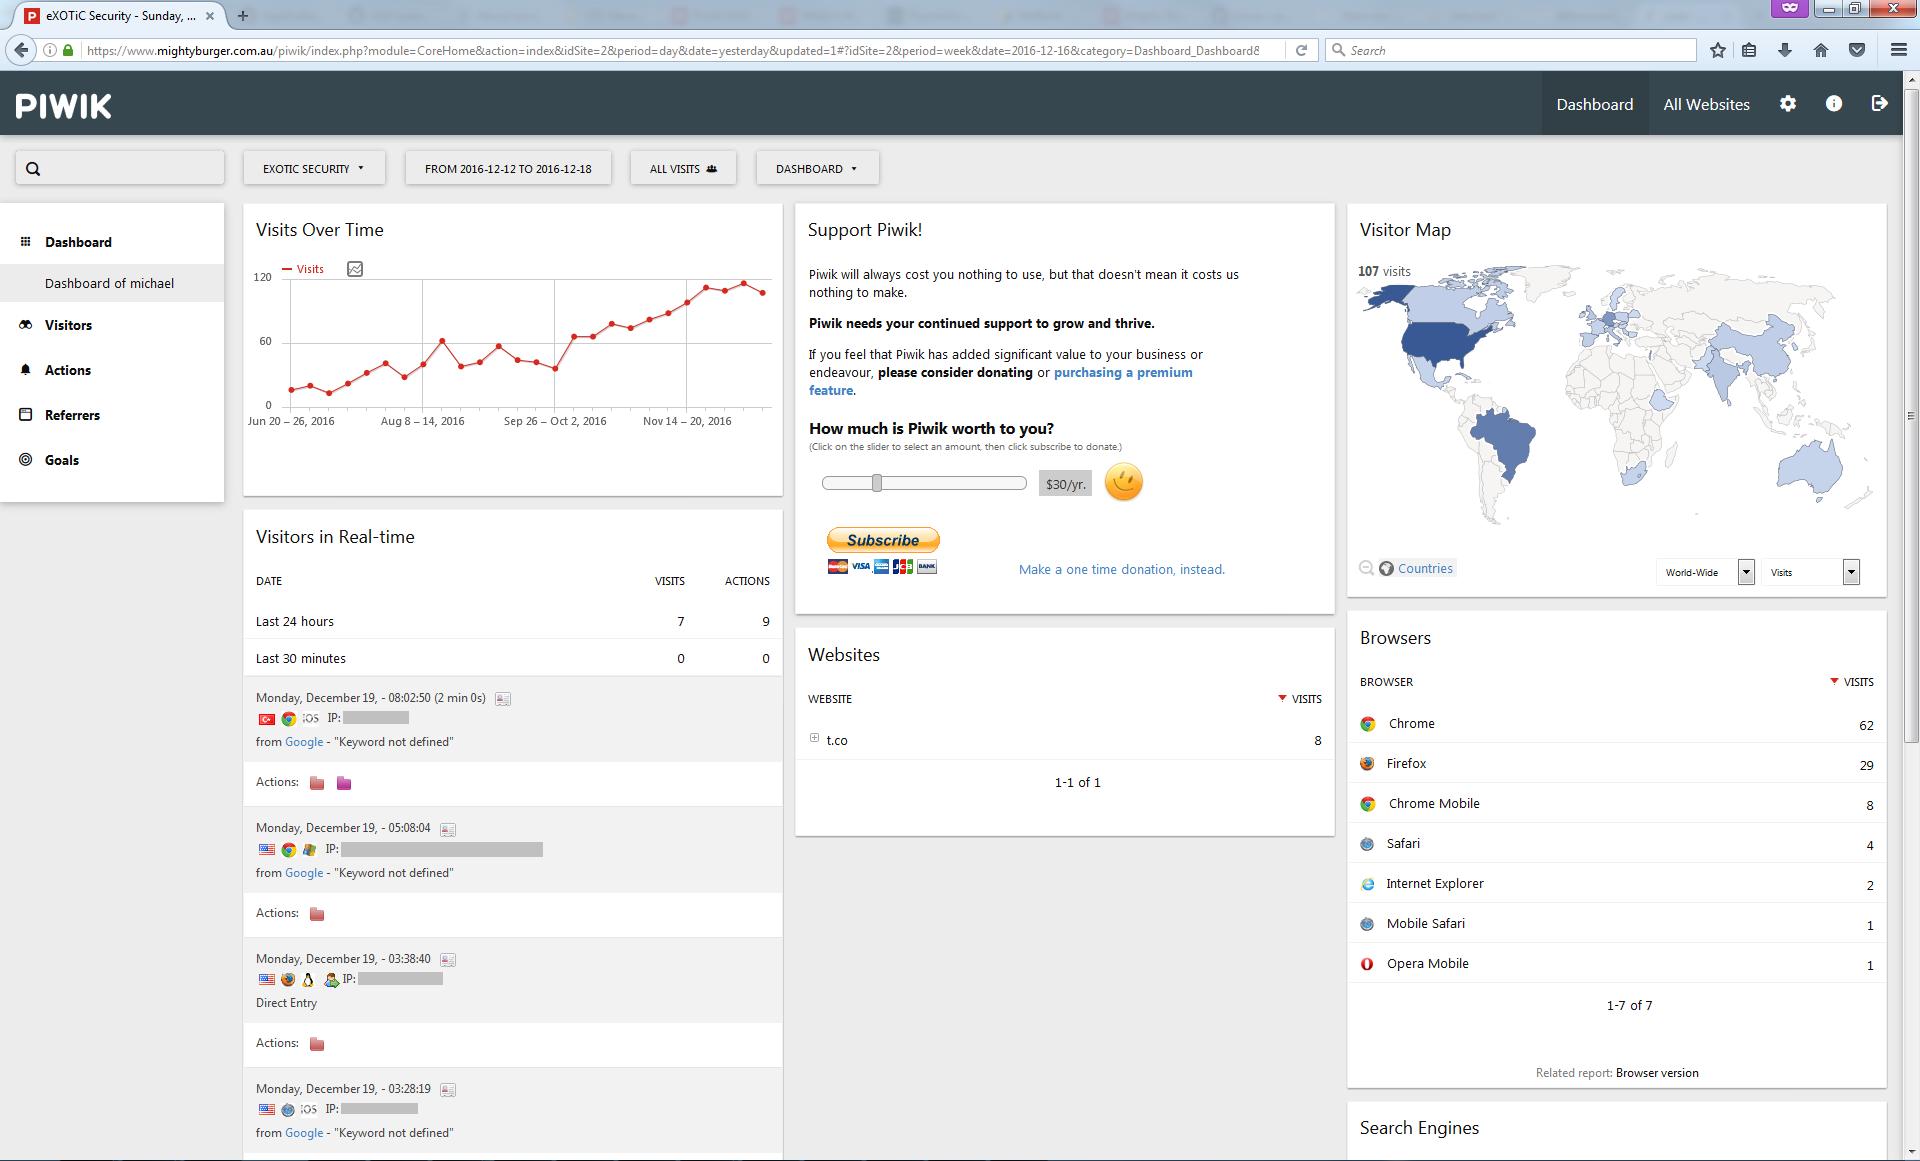 Piwik 3.0 new dashboard